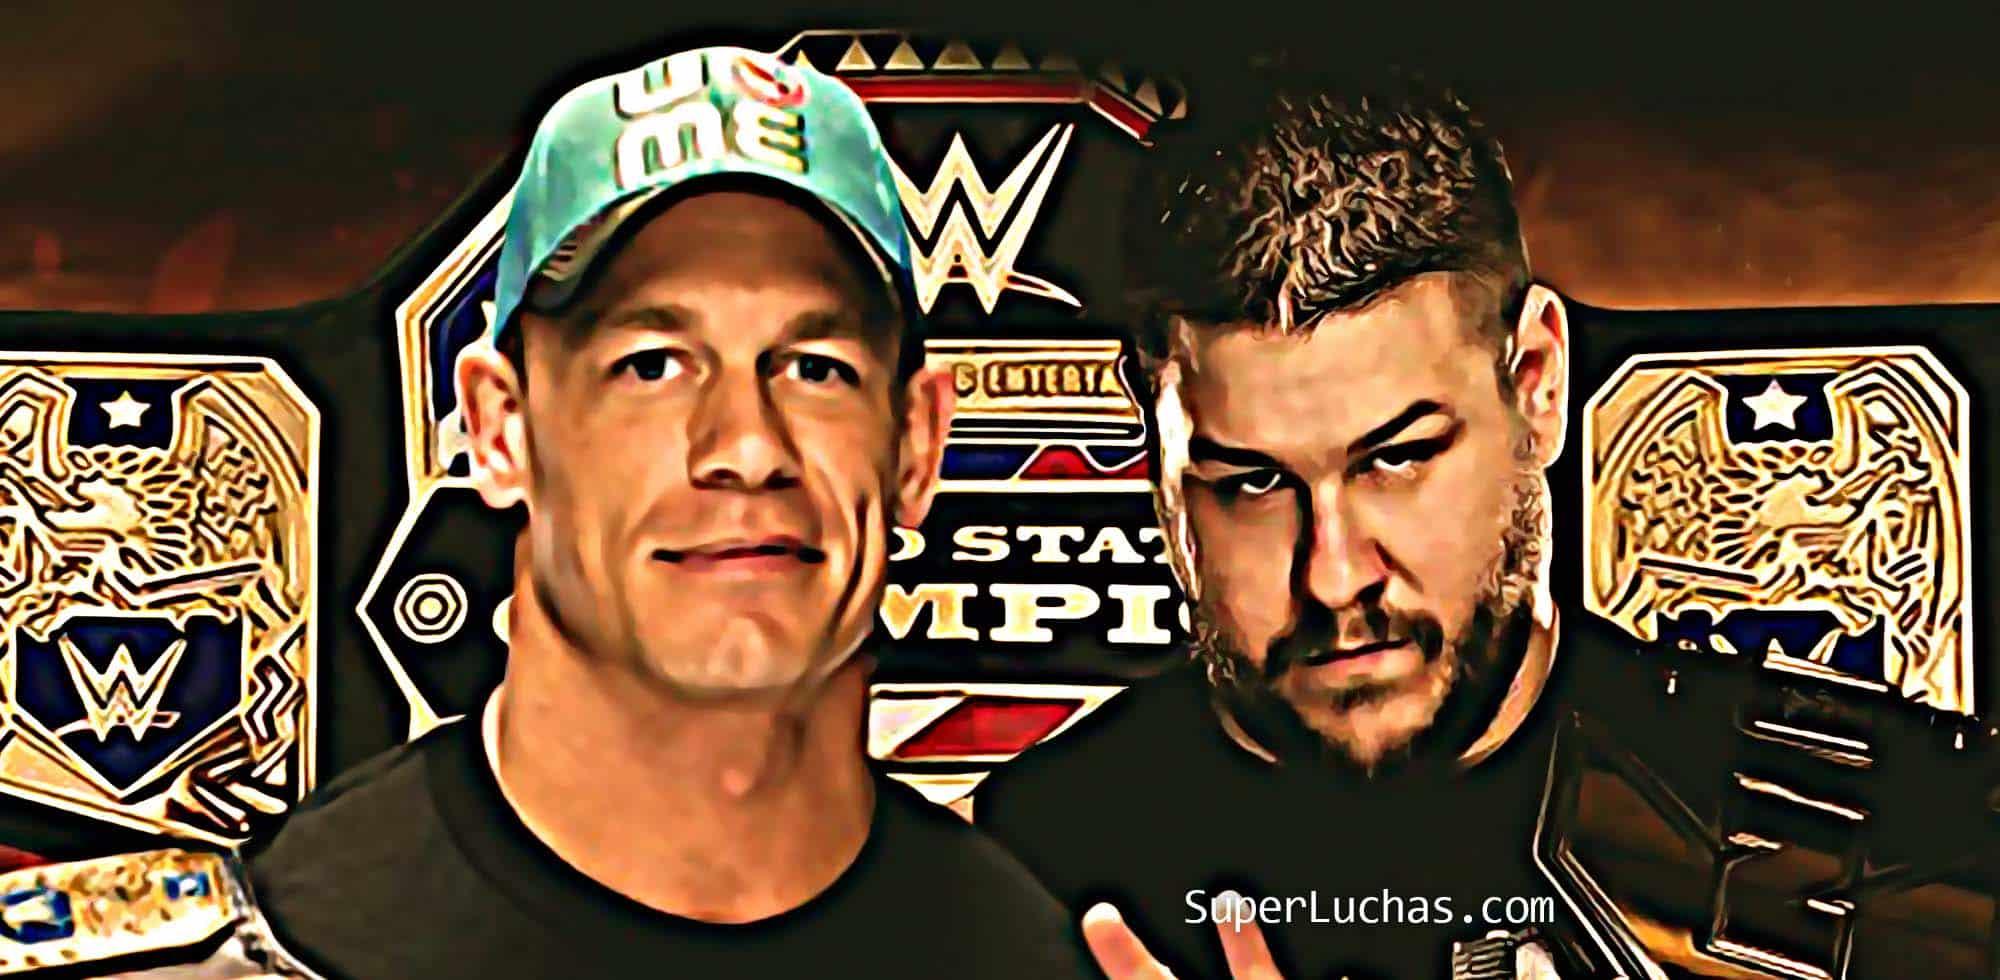 Un clásico de Battleground: John Cena vs. Kevin Owens en 2015 33